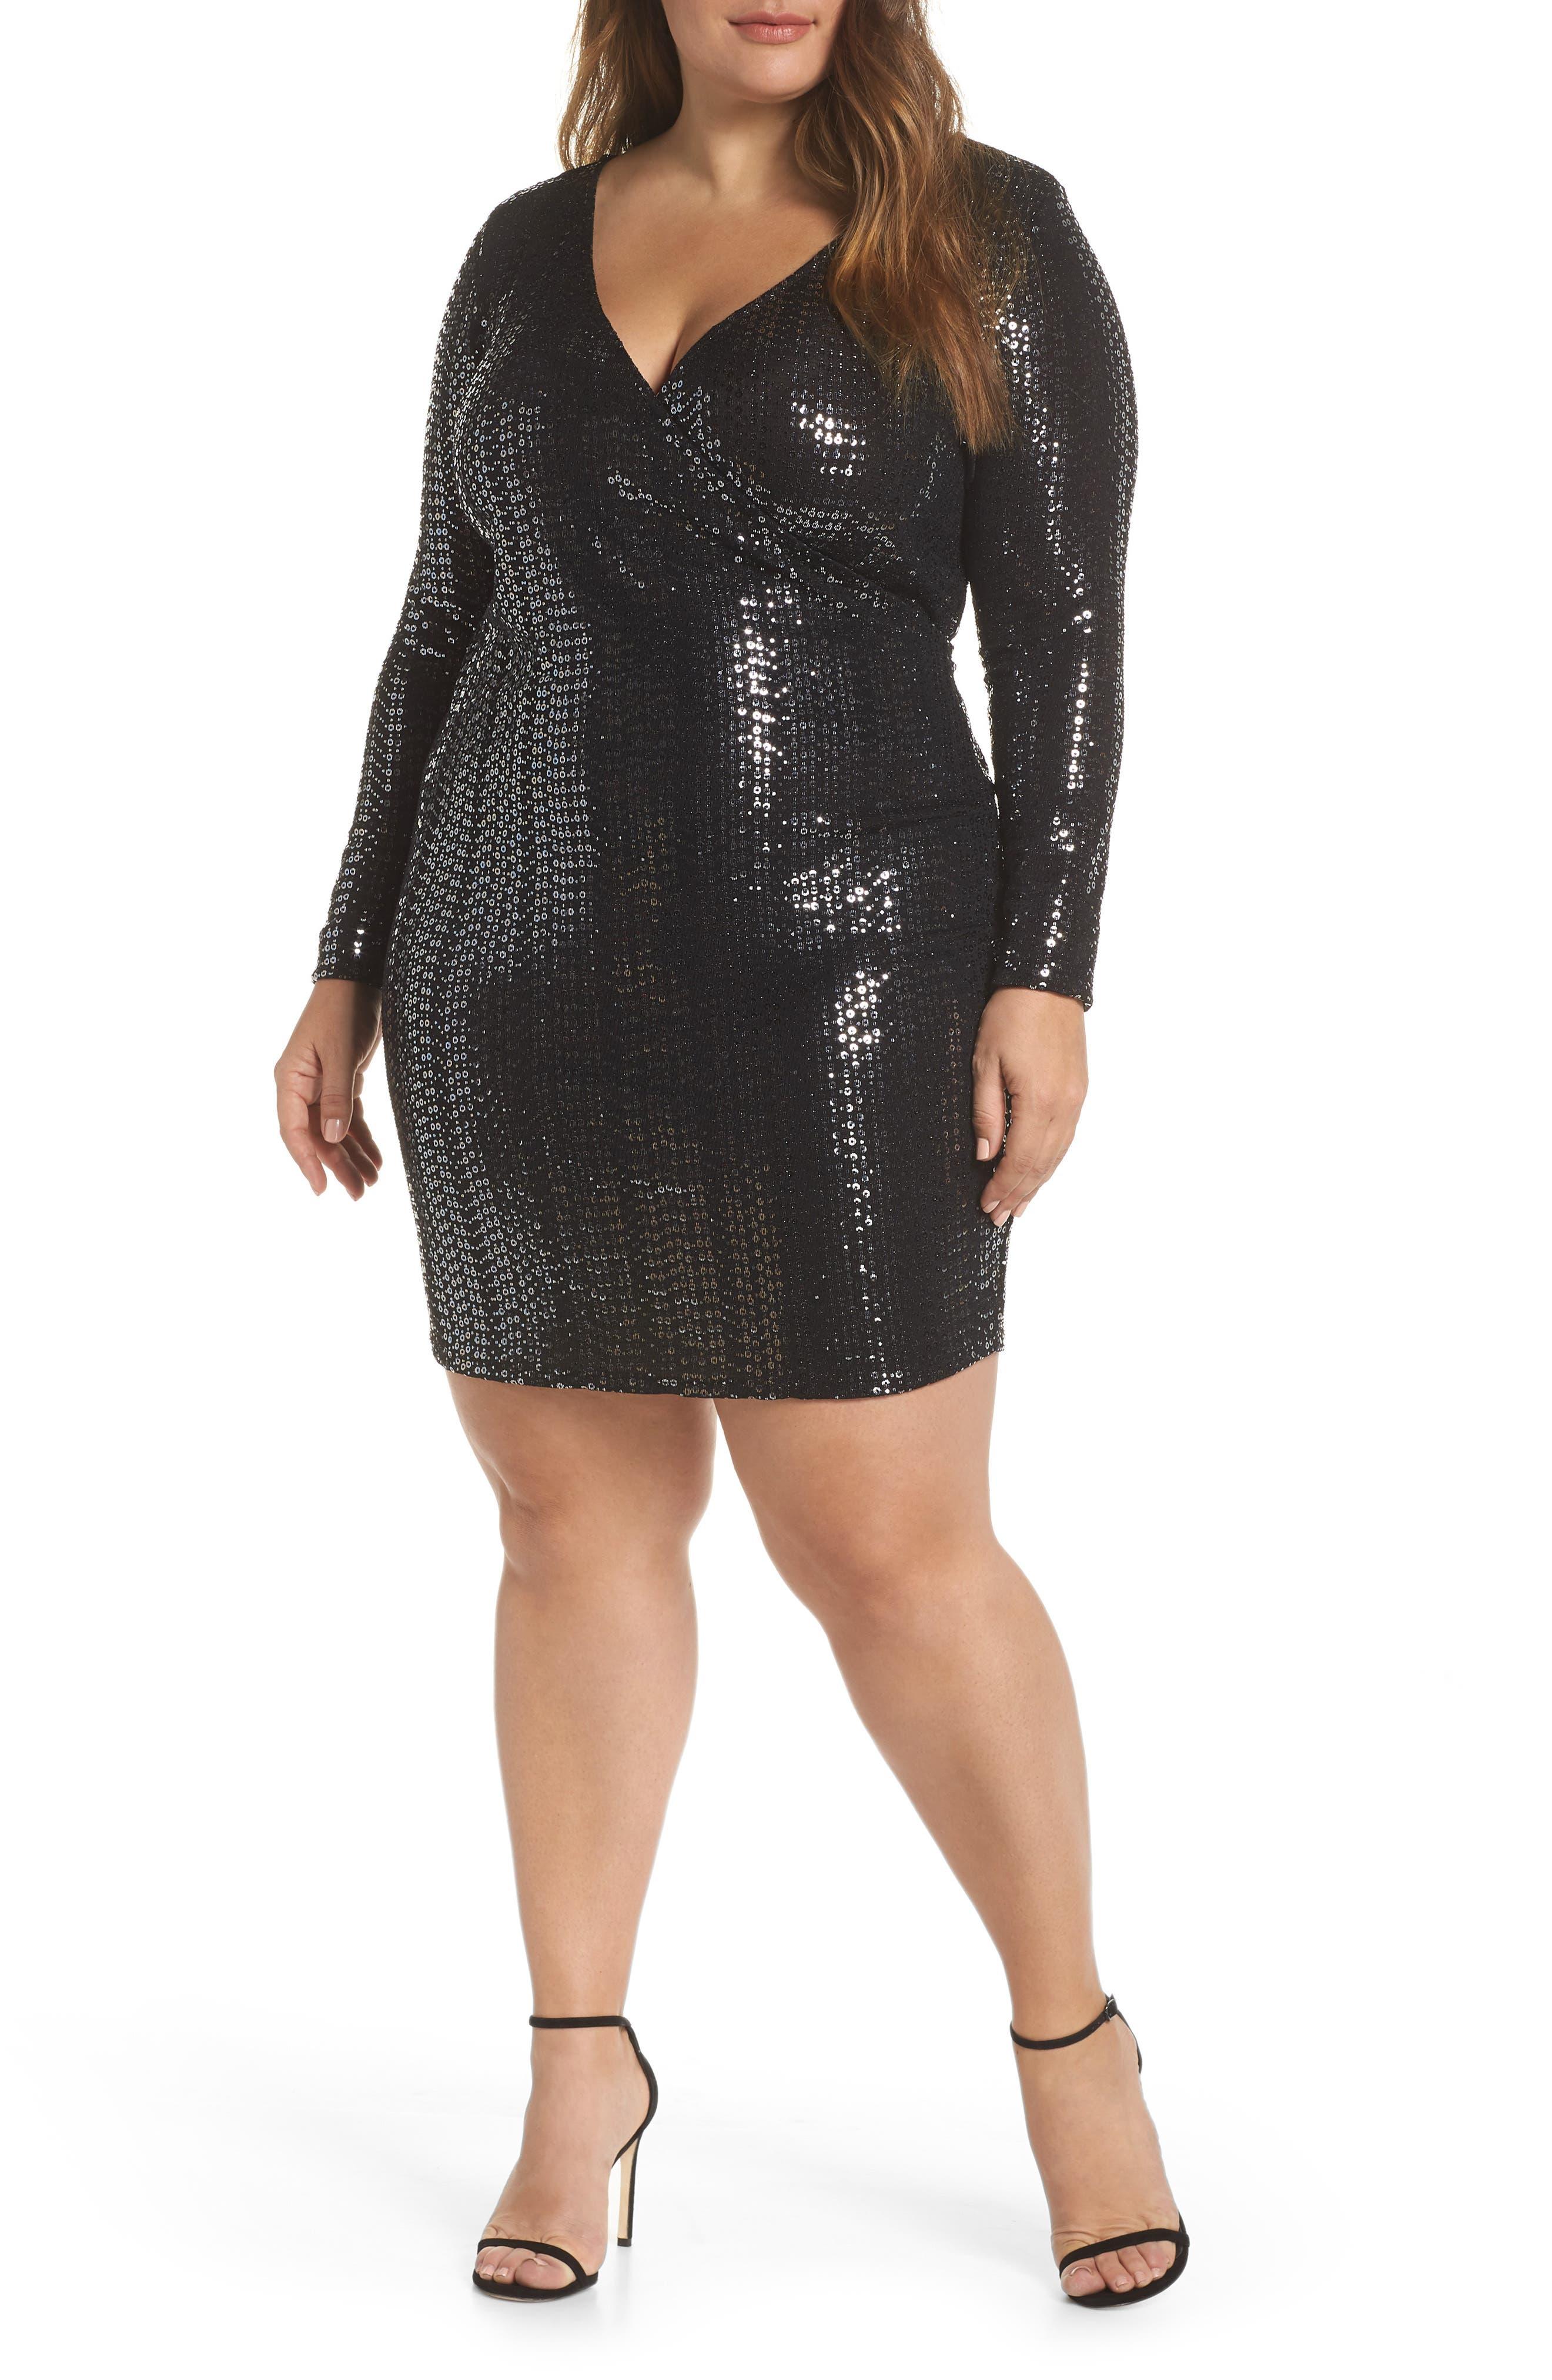 Plus Size Sequin Shift Dress and Black